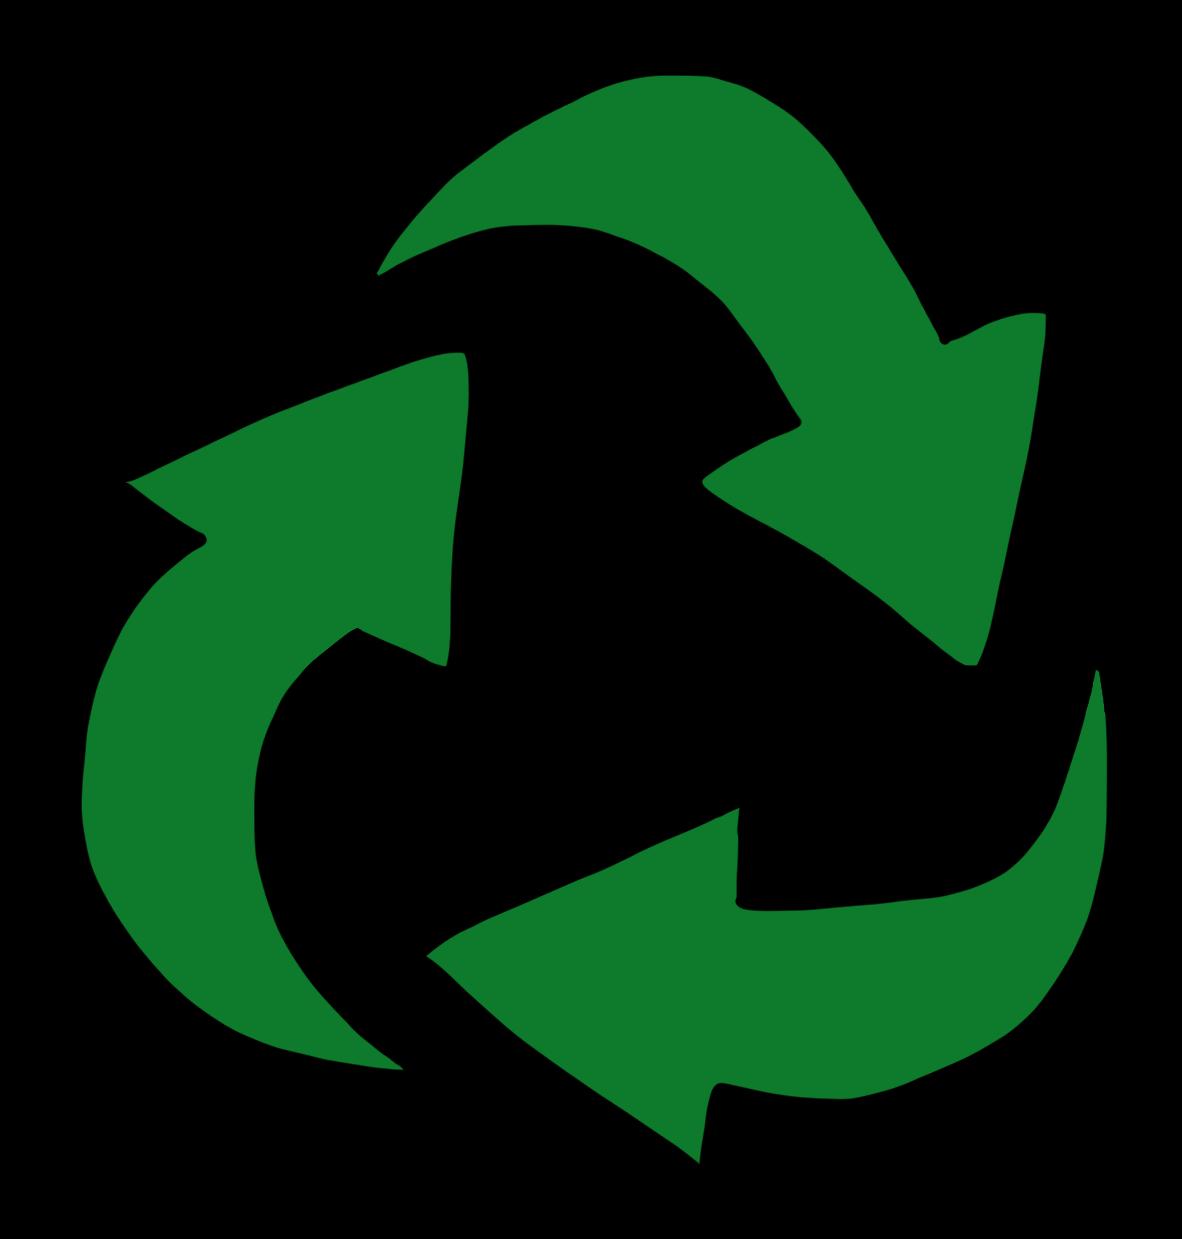 Clip art recycle symbol clipart kid 4